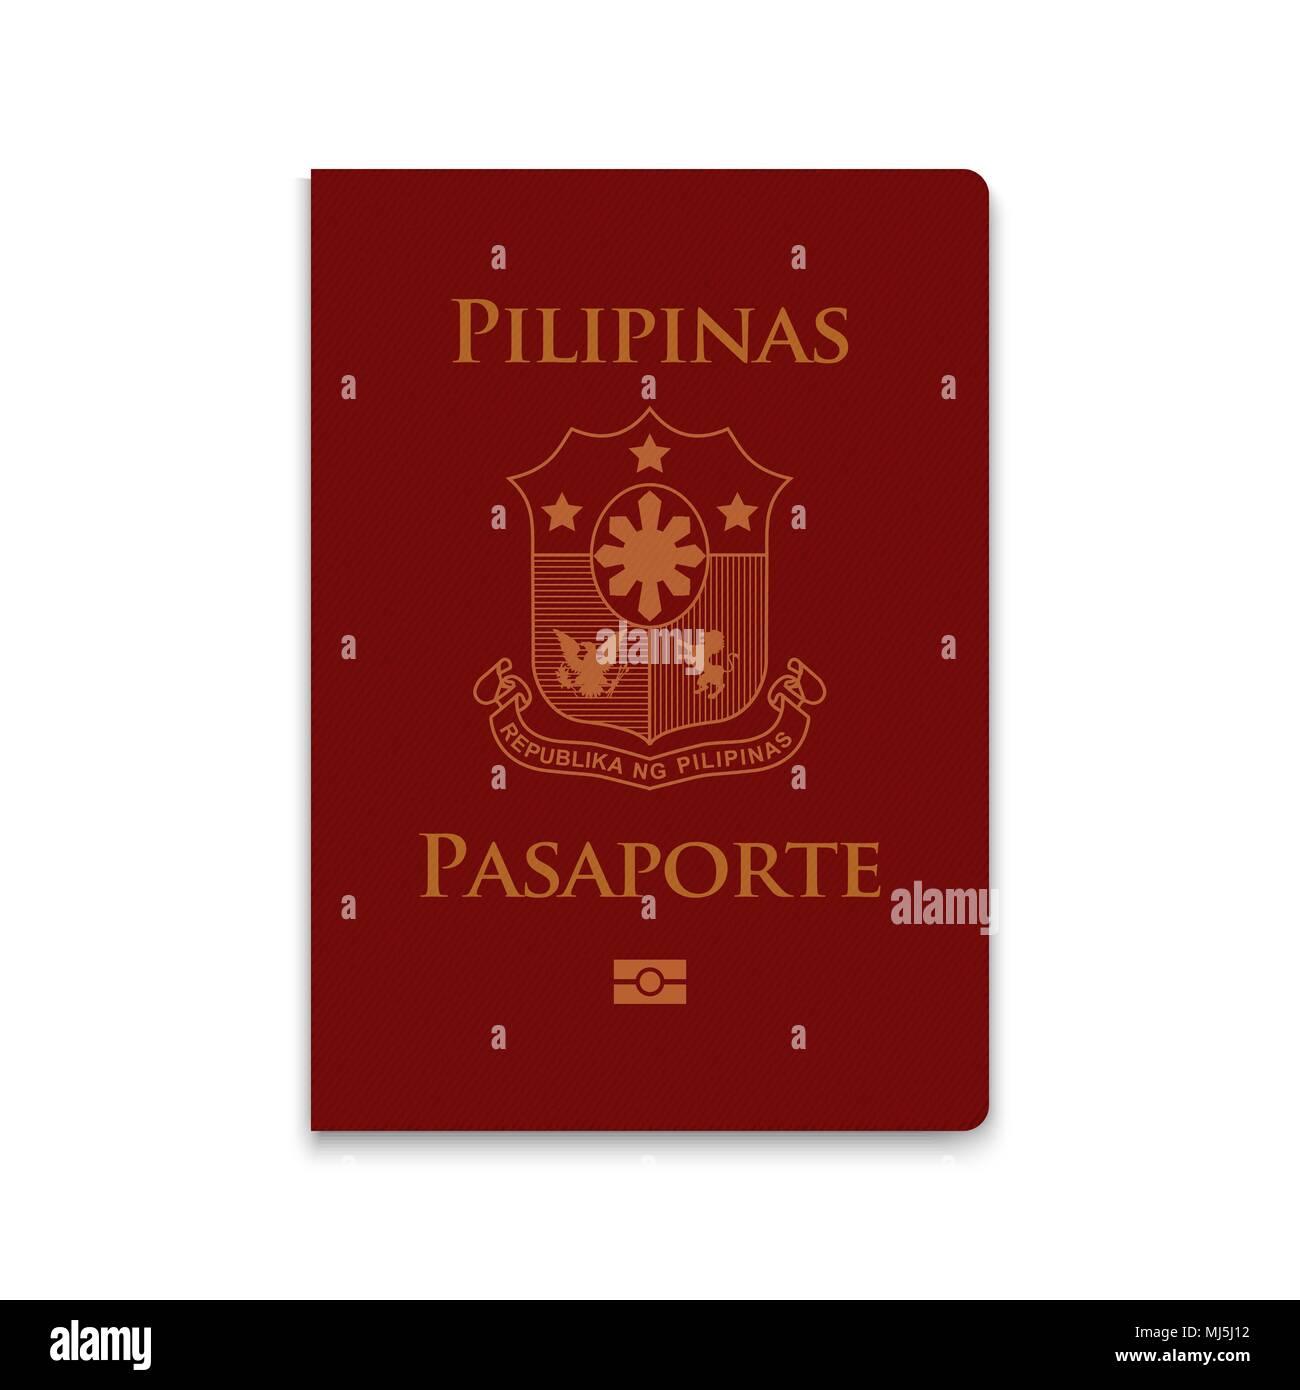 Passport of Philippines. Vector illustration - Stock Image